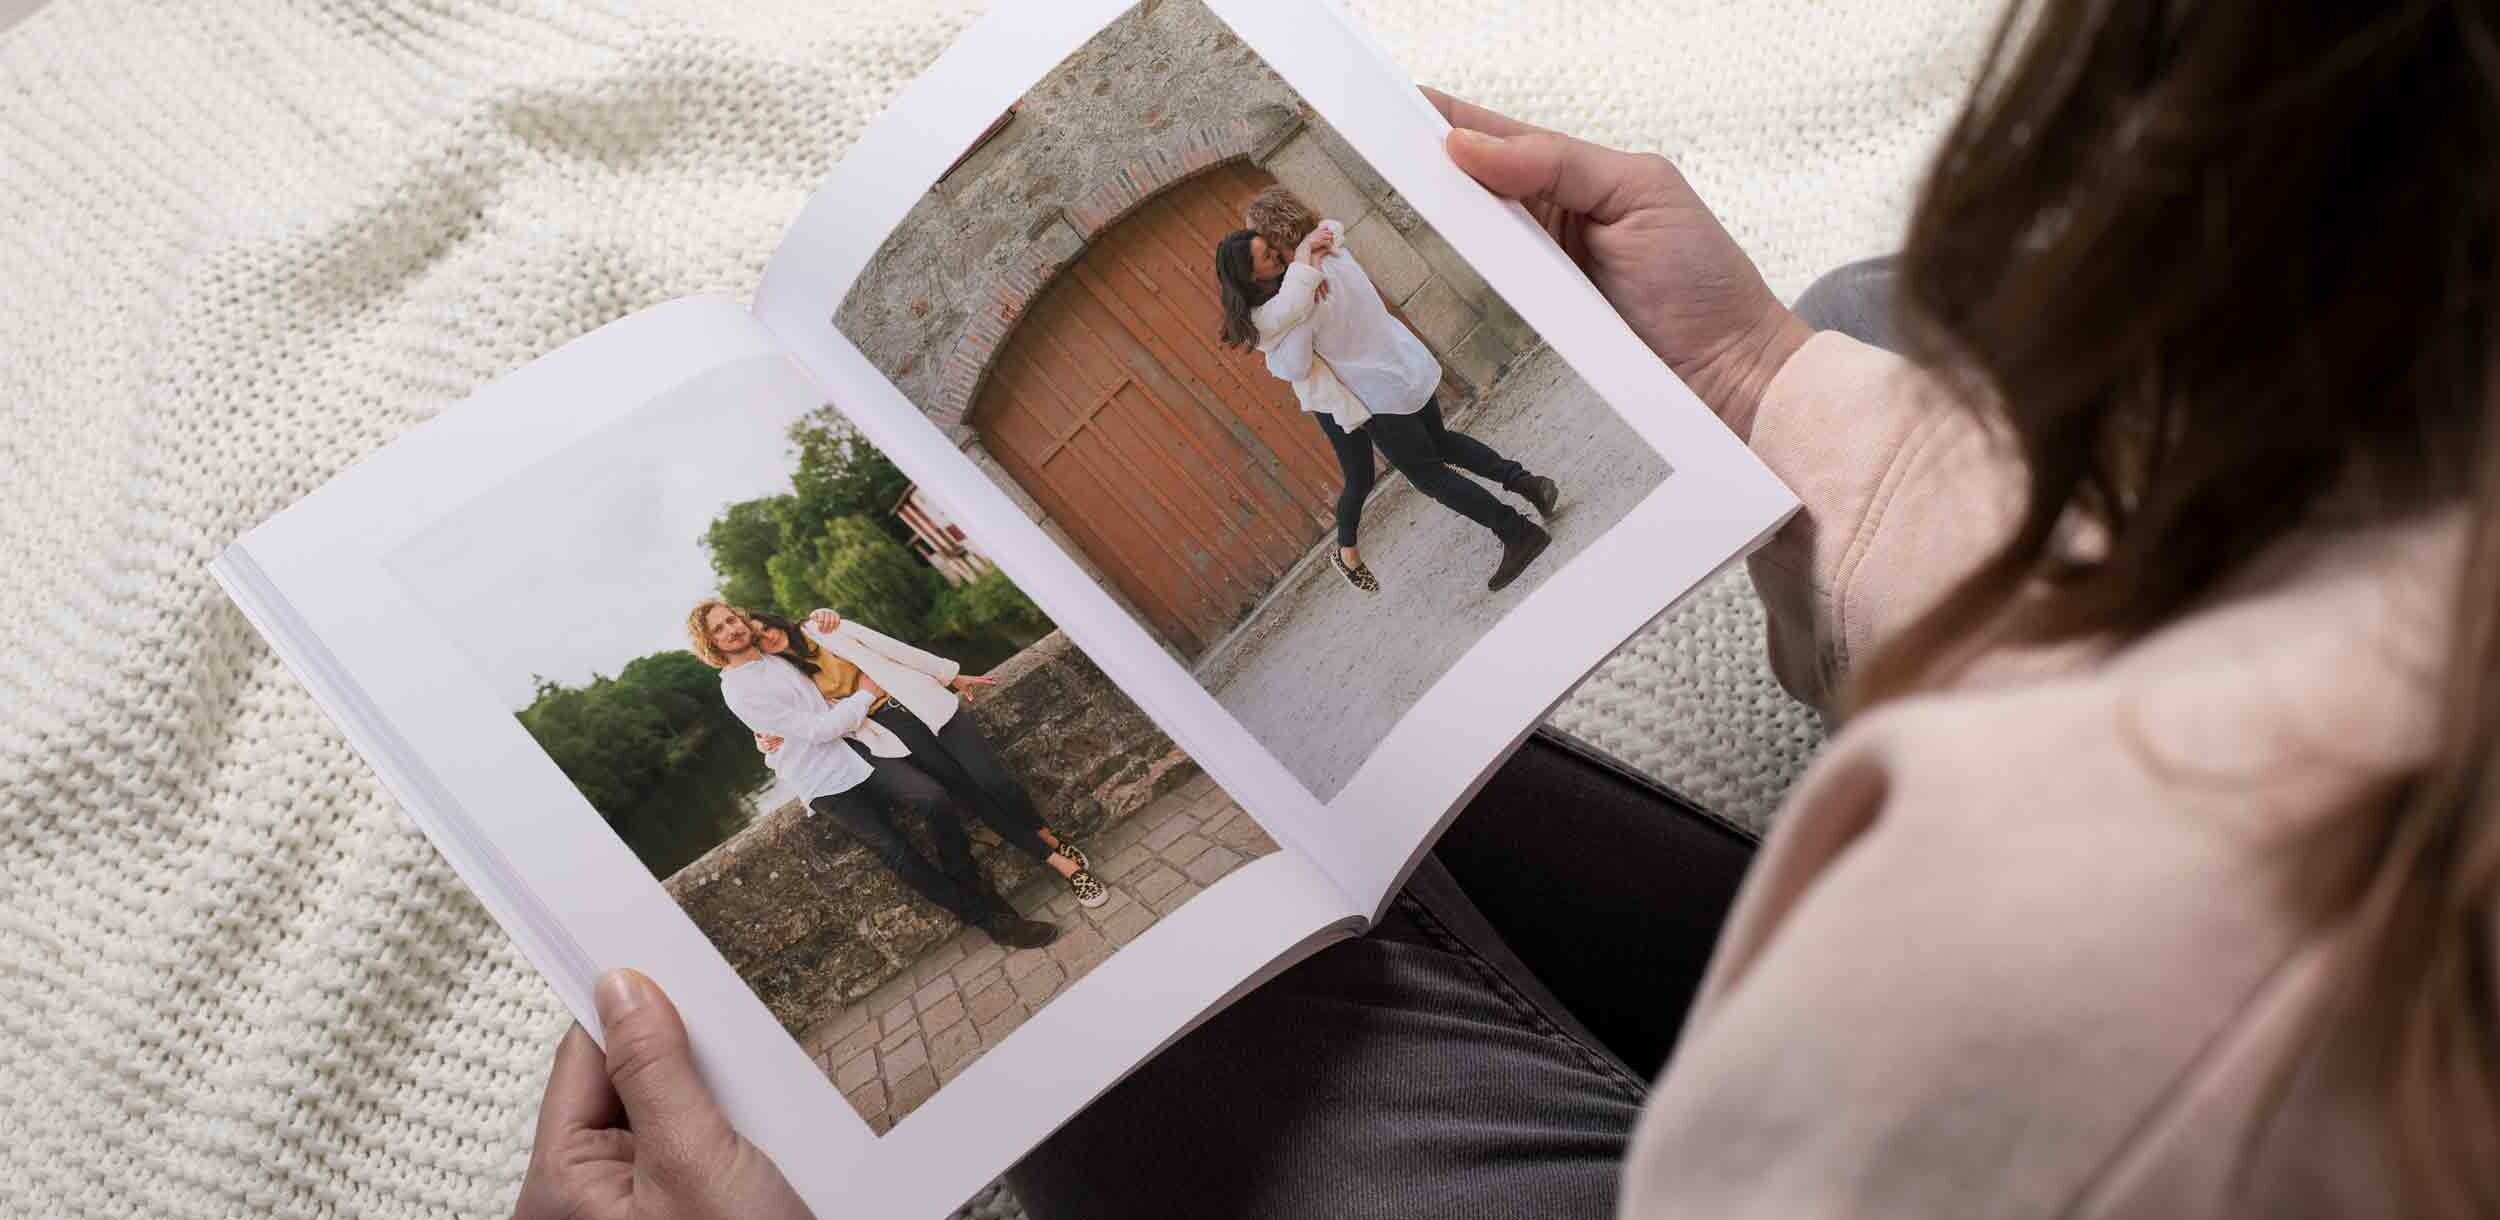 Album photo d'amour